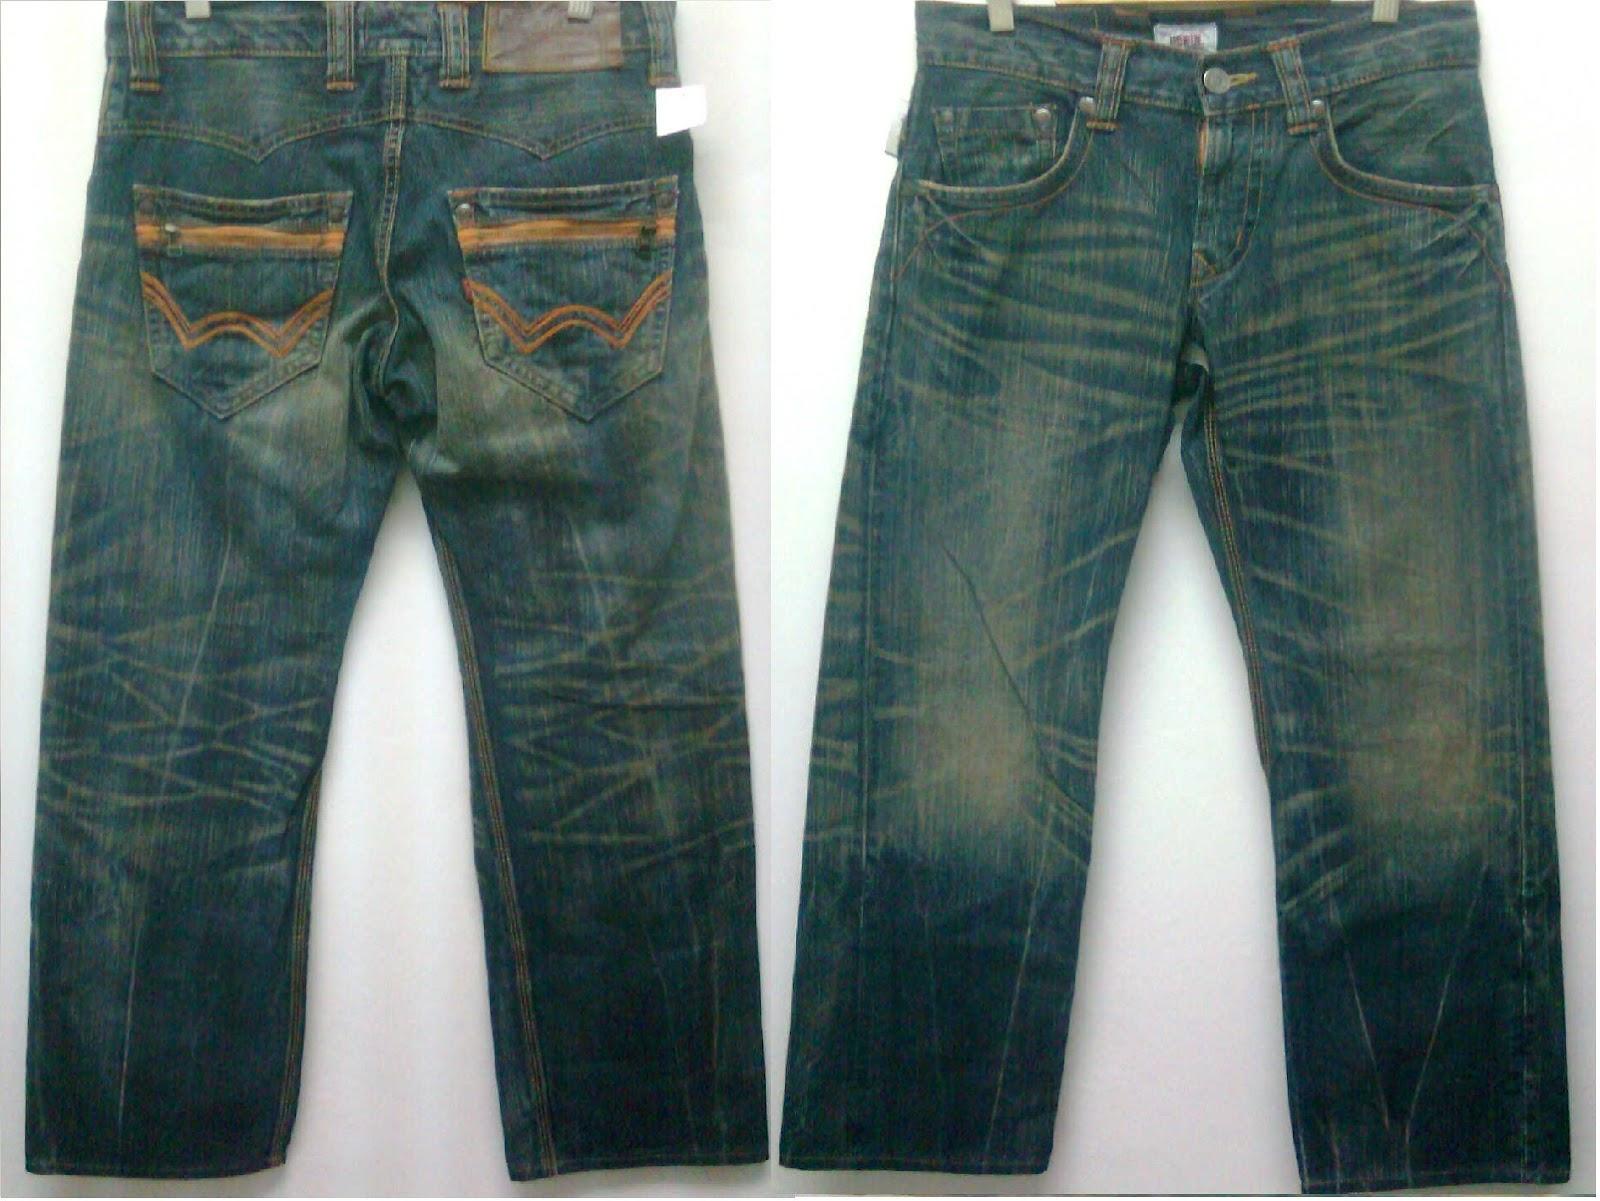 Rakutanstock Com Edwin Xu Exclusive Vintage Used Jeans